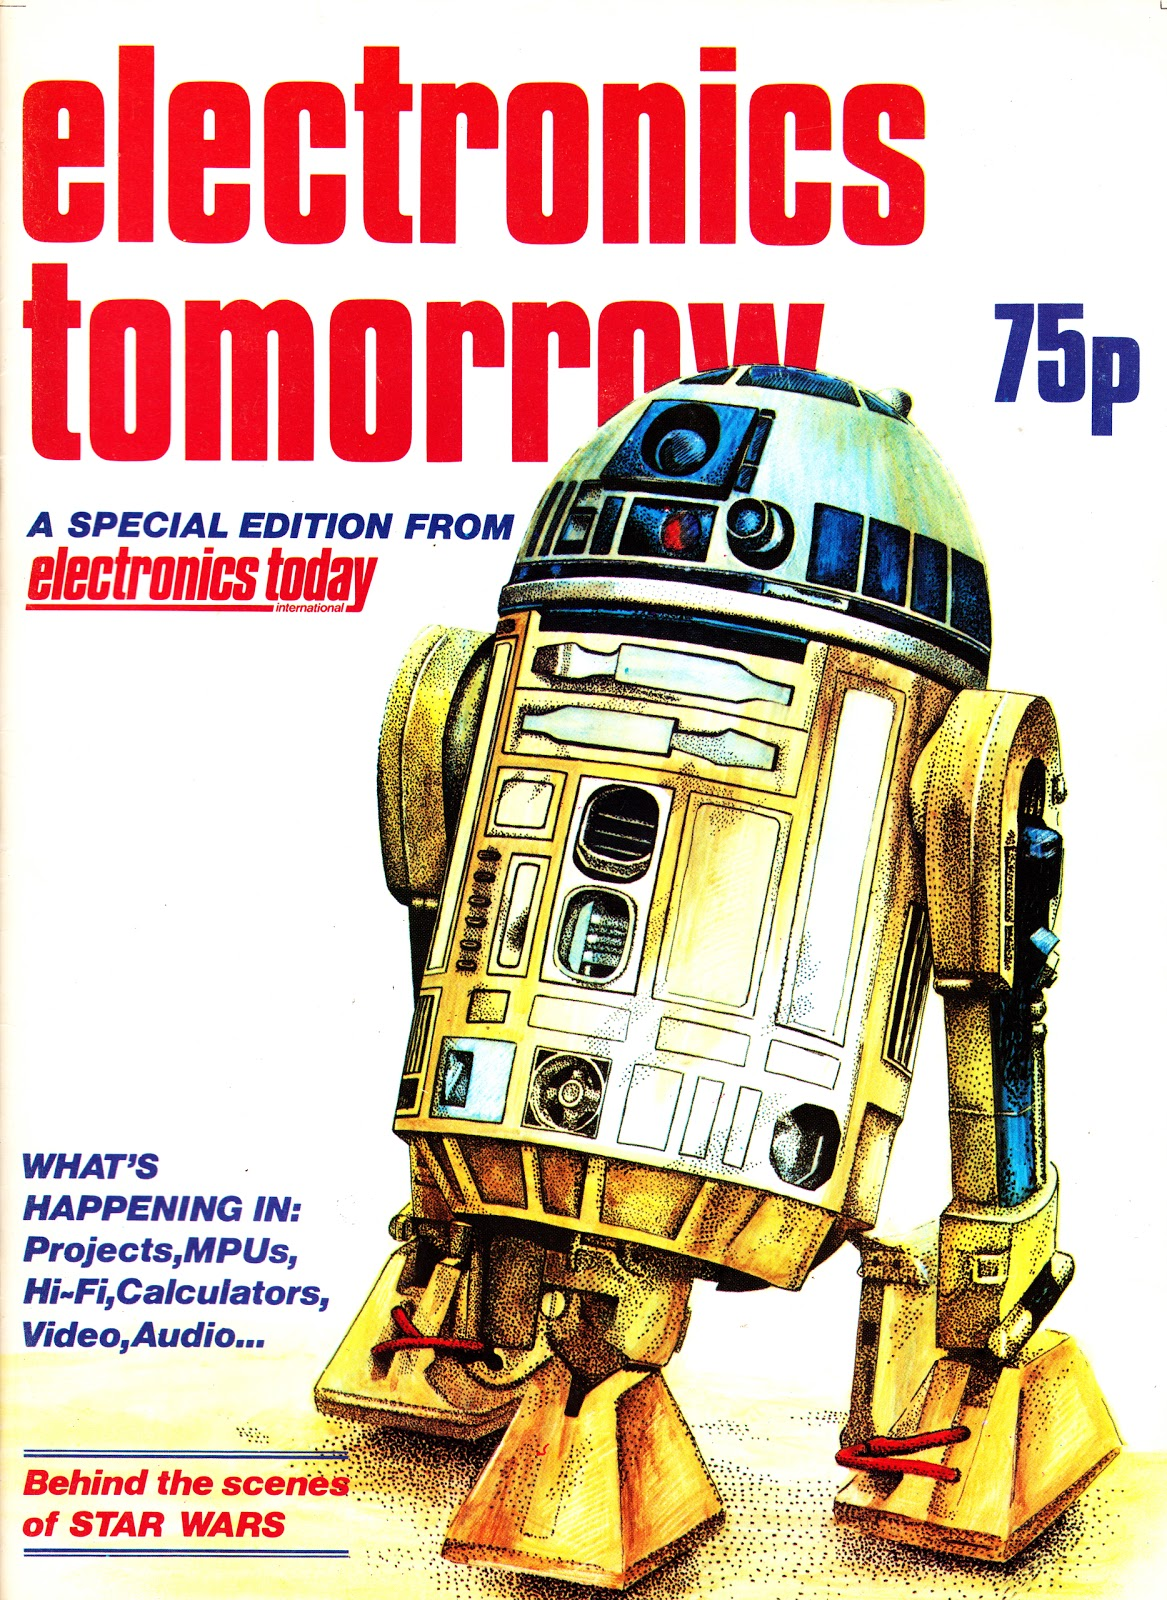 STARLOGGED - GEEK MEDIA AGAIN: 1977: STAR WARS DROIDS IN ELECTRONICS